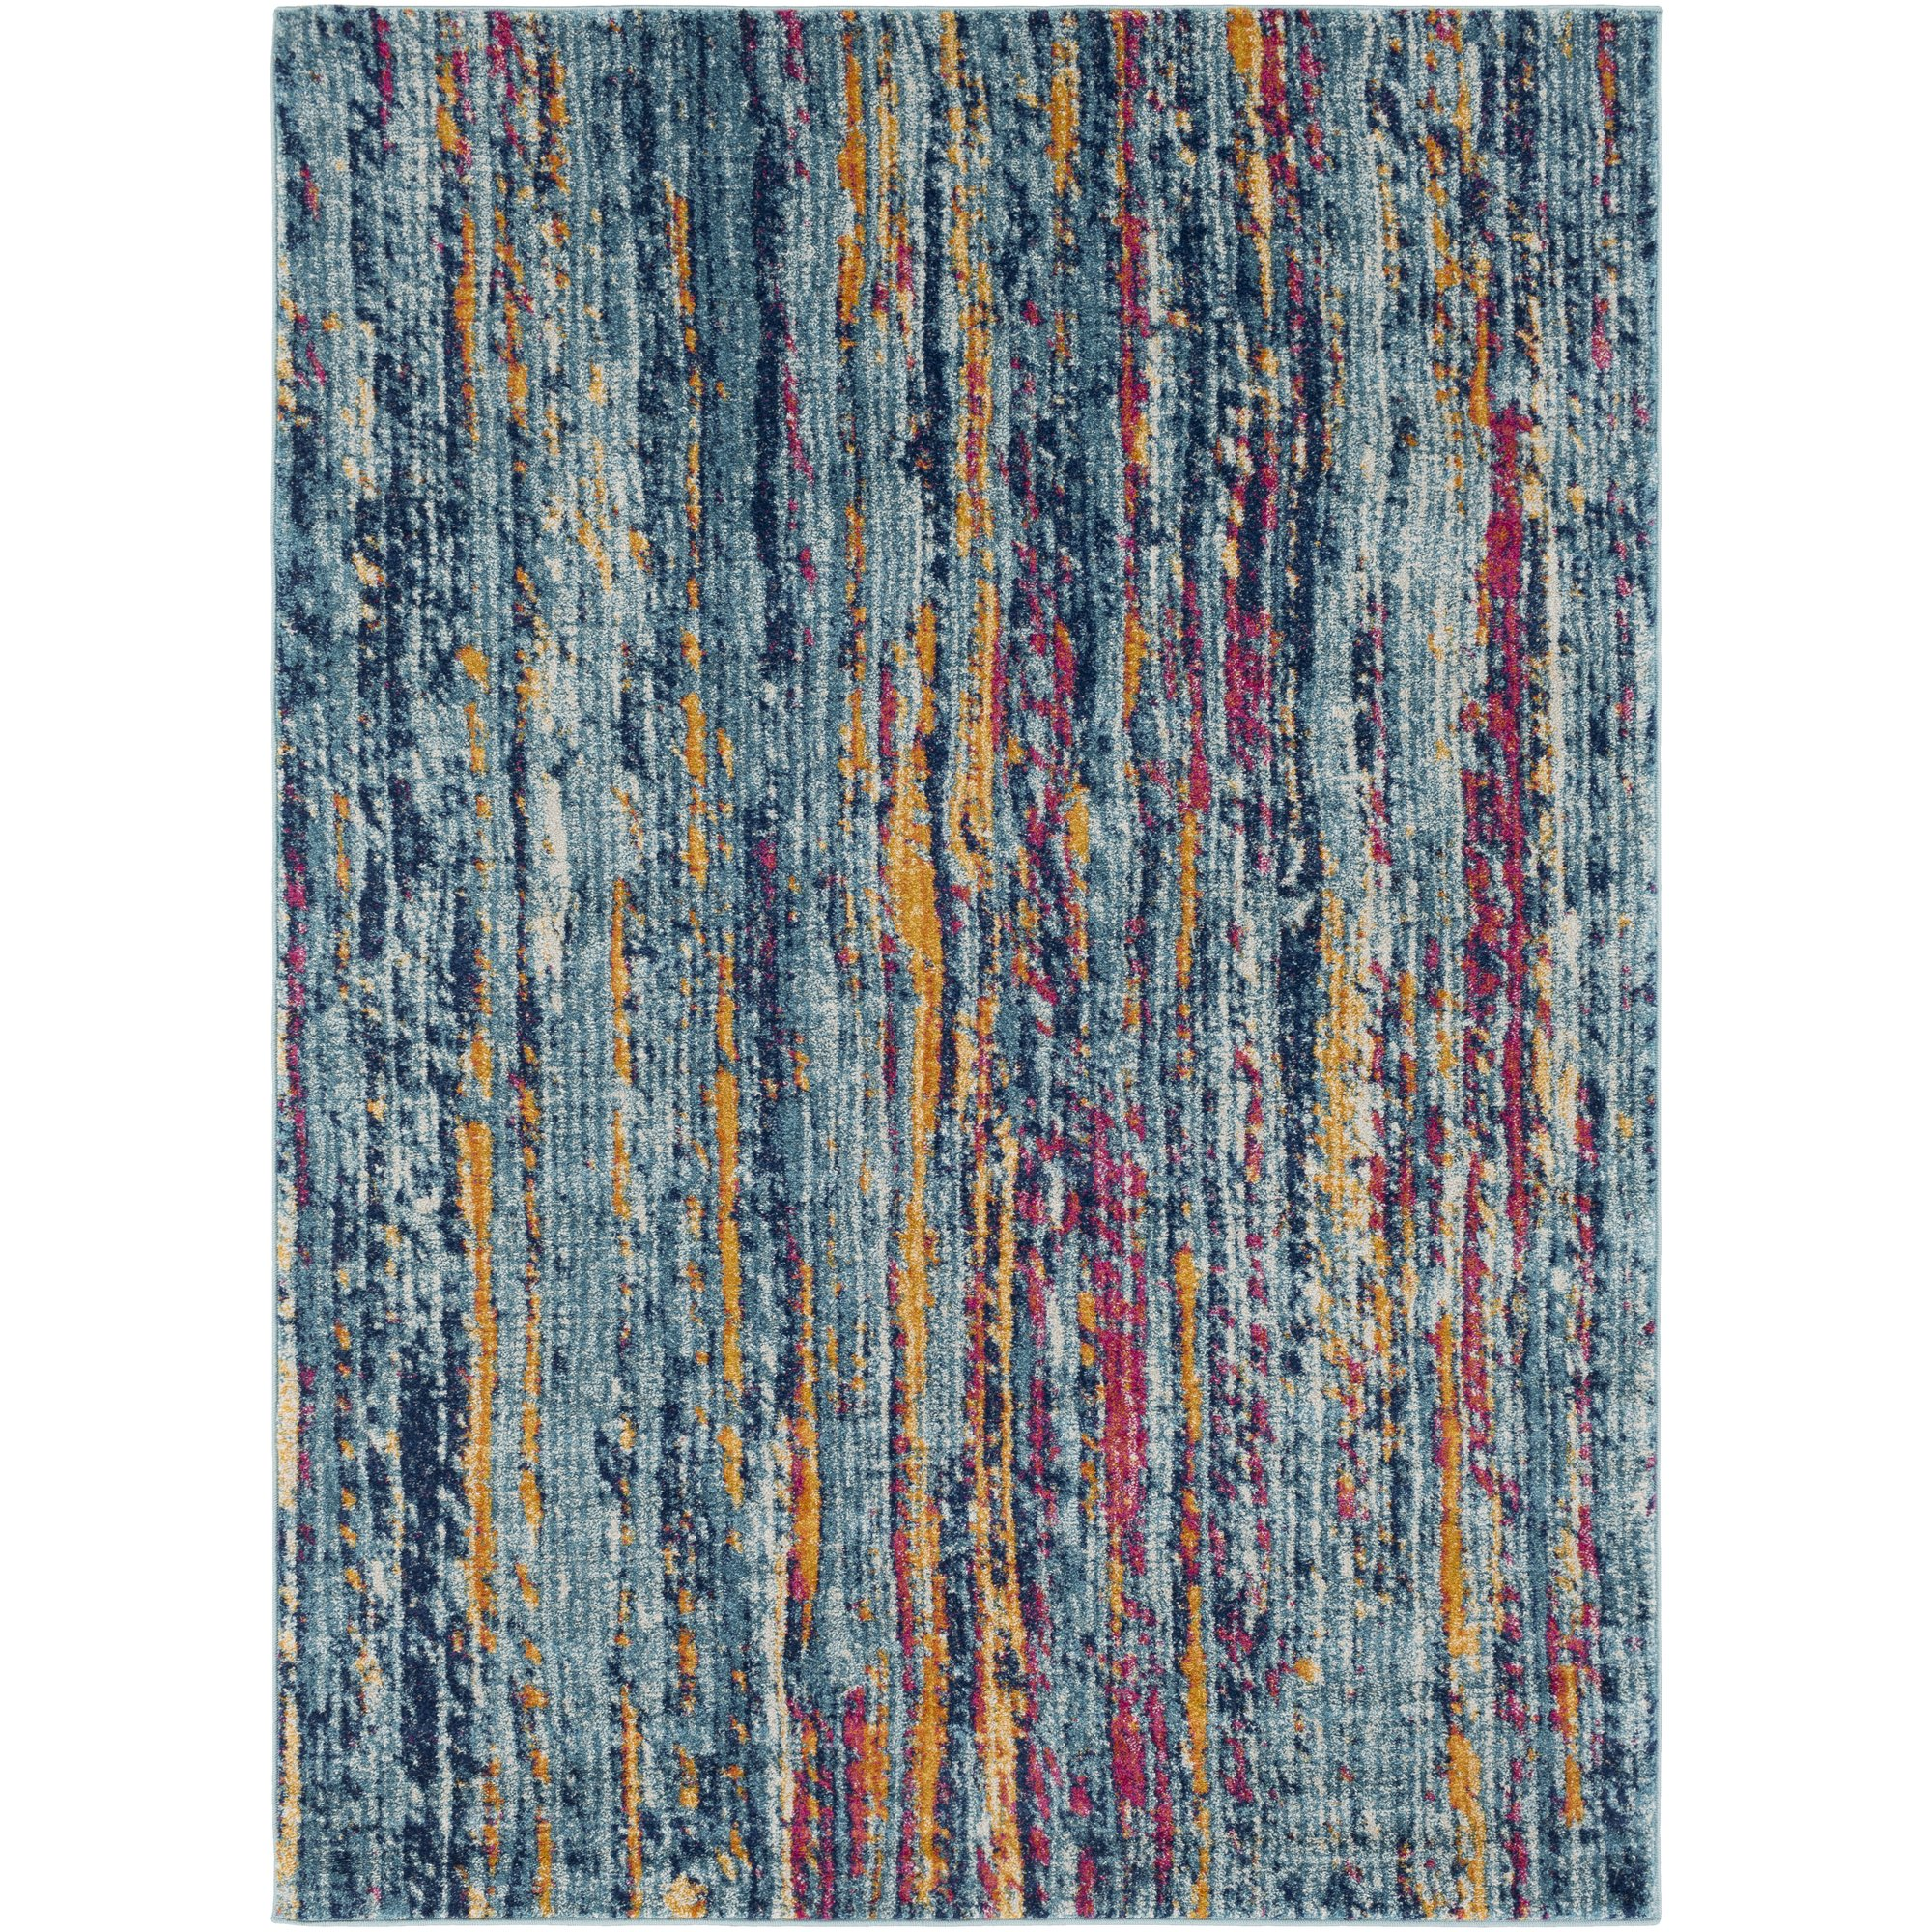 Lamar Blue and Orange Modern Area Rug 2'7'' x 7'3'' by WorldWeavers